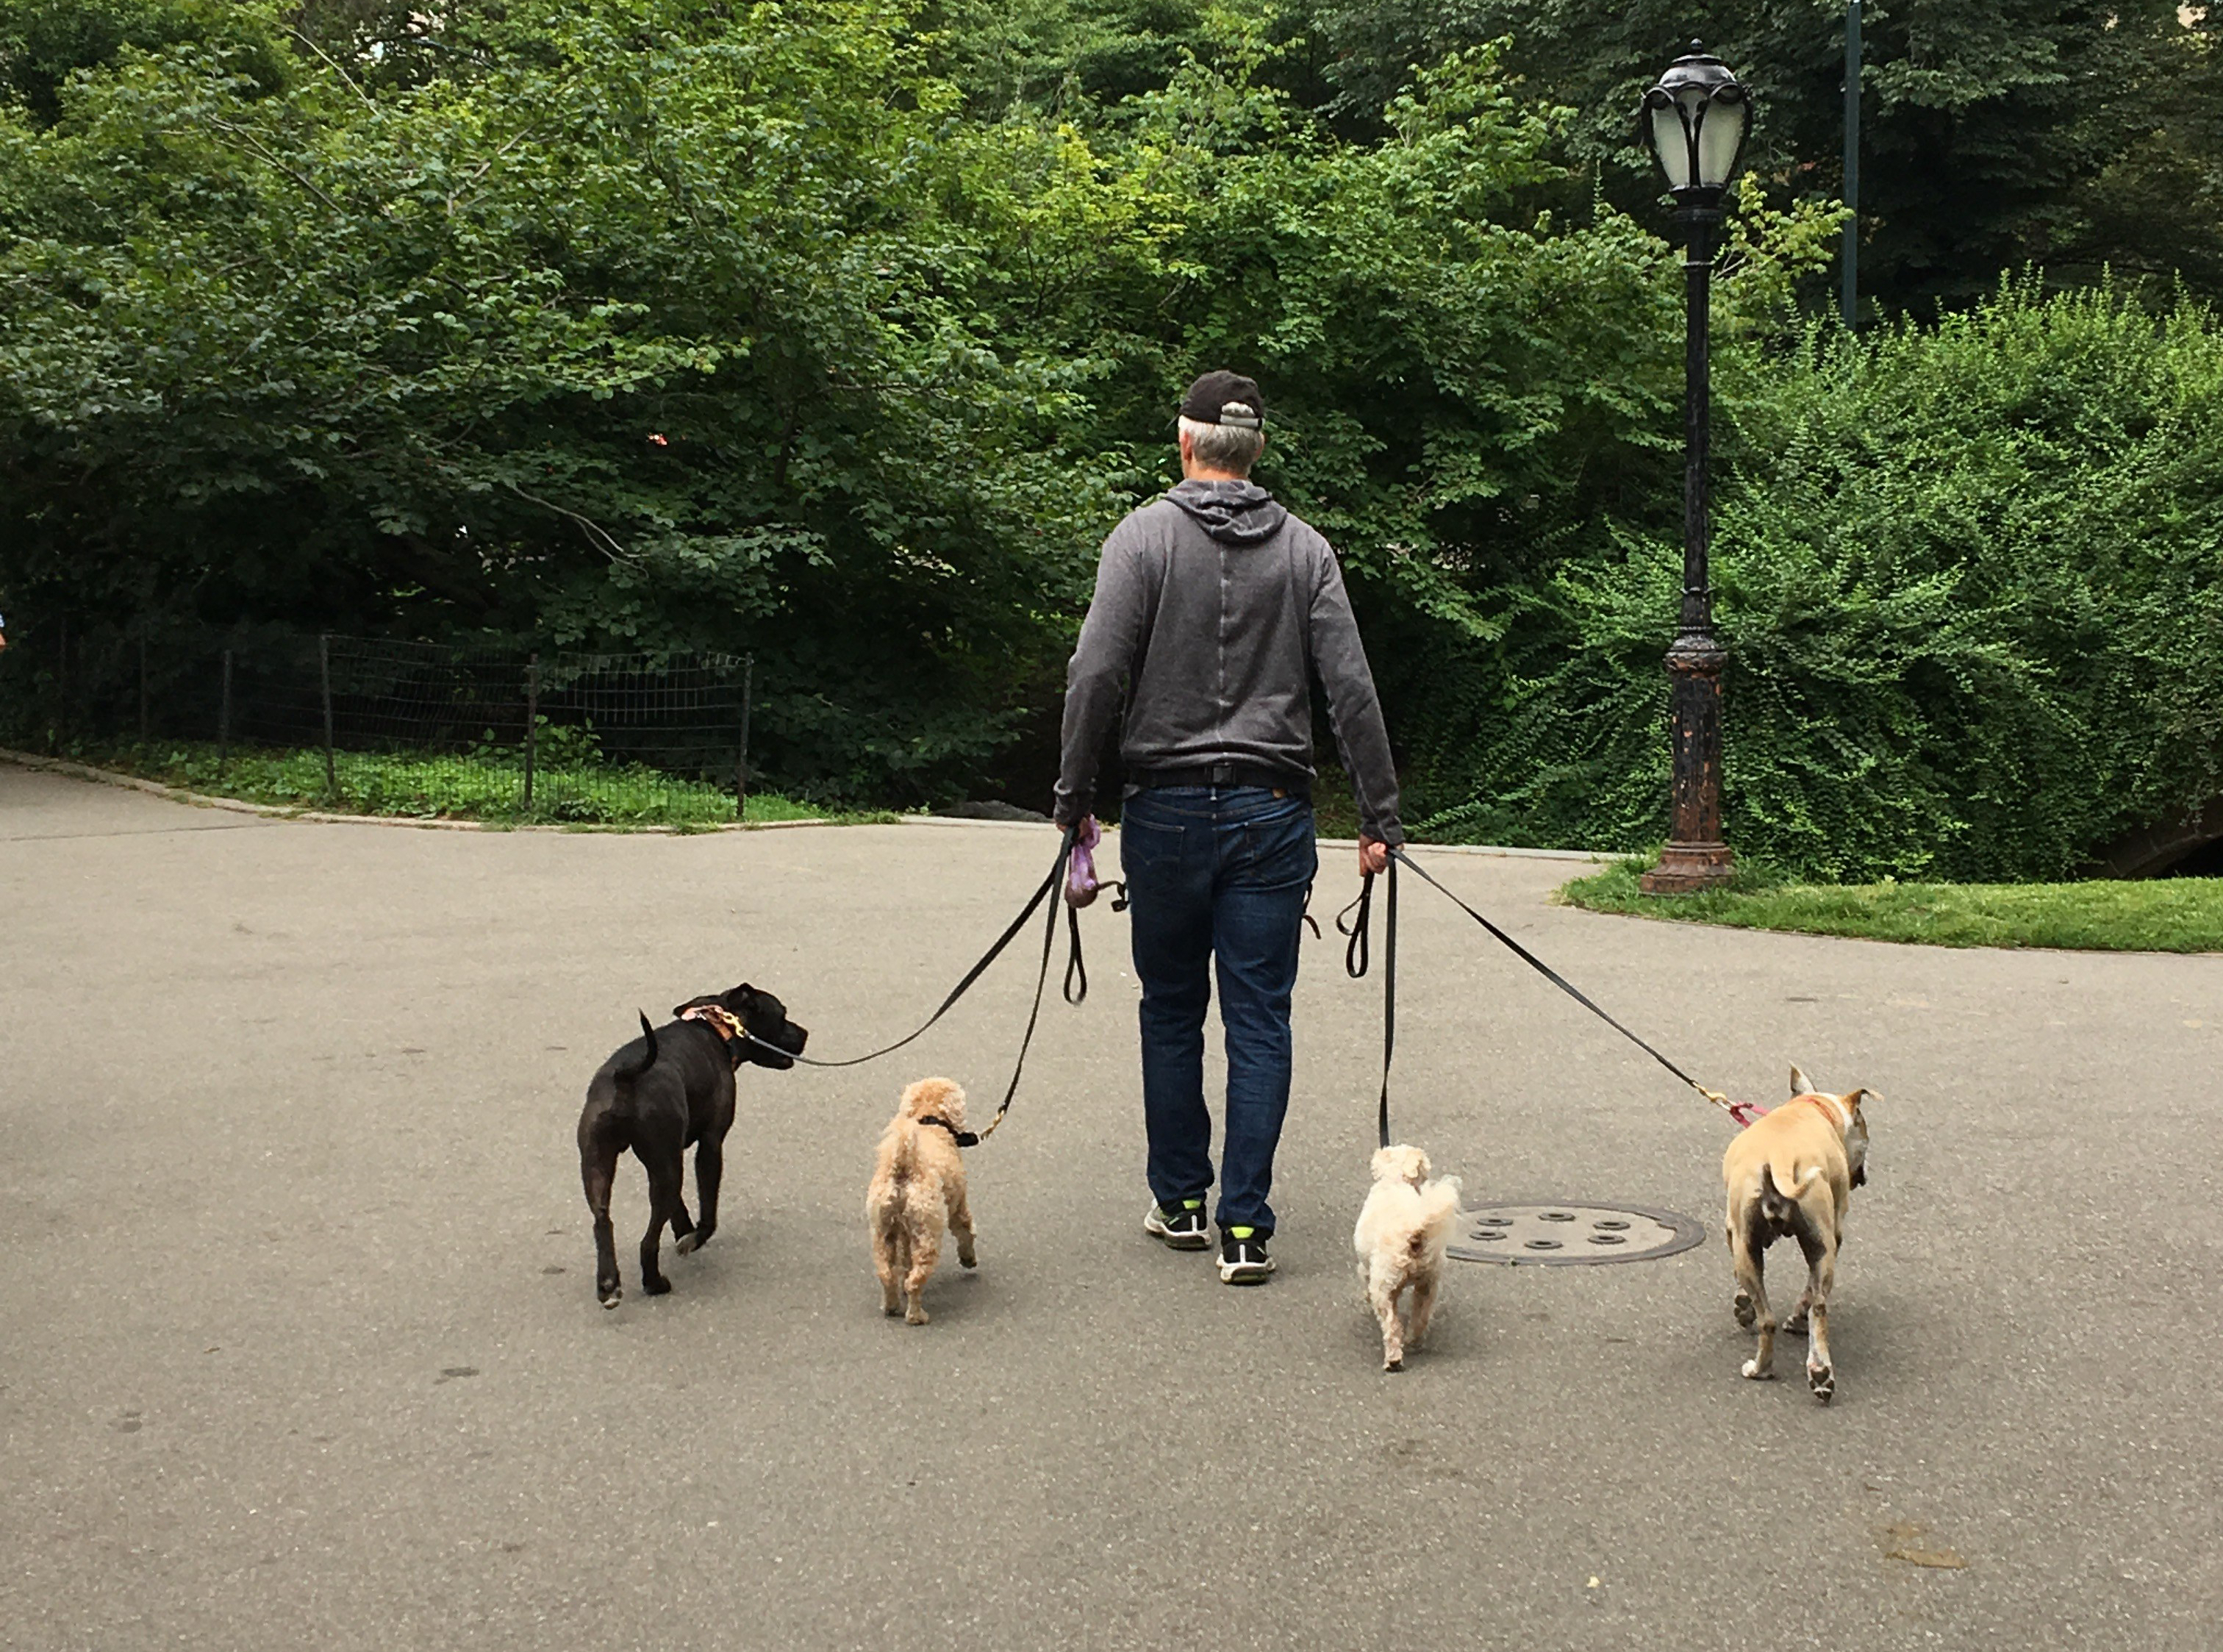 hundeblog_dogsoulmate_Reisen_ohne_hund